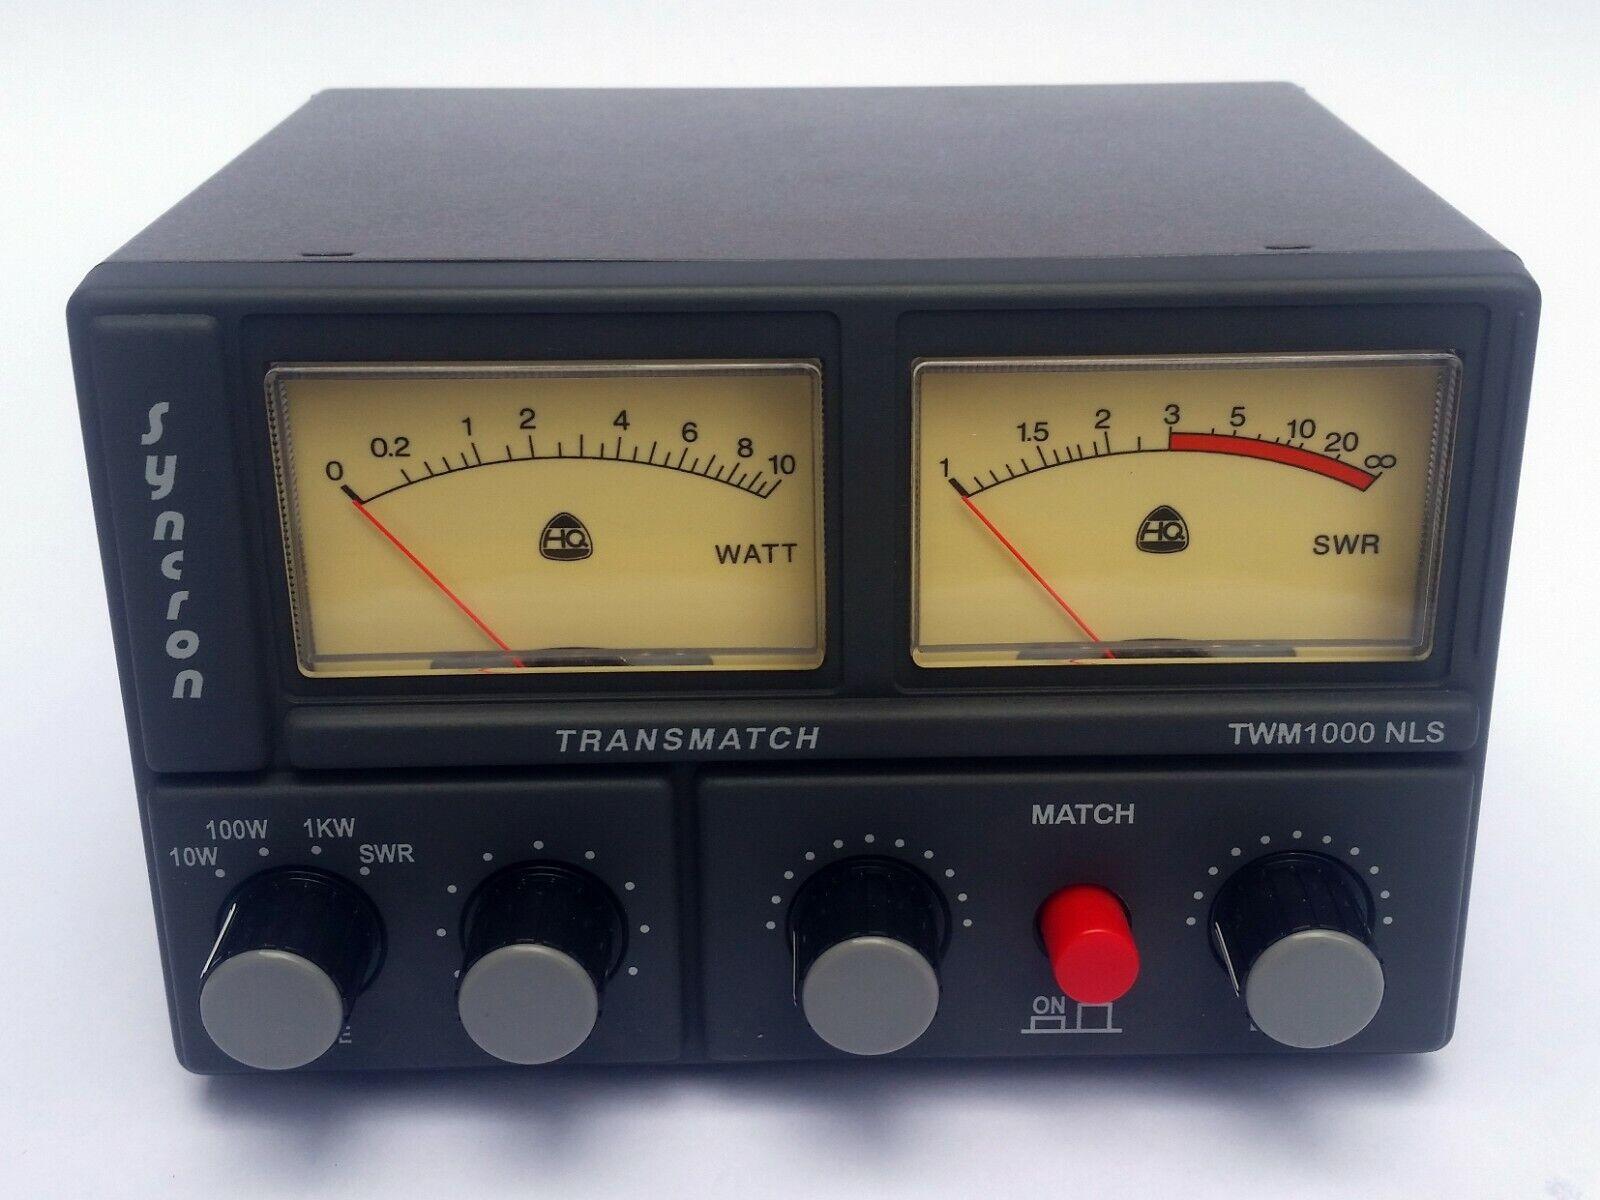 Syncron TWM1000NLS  SWR Power Meter Matcher 26-30 MHz Transm